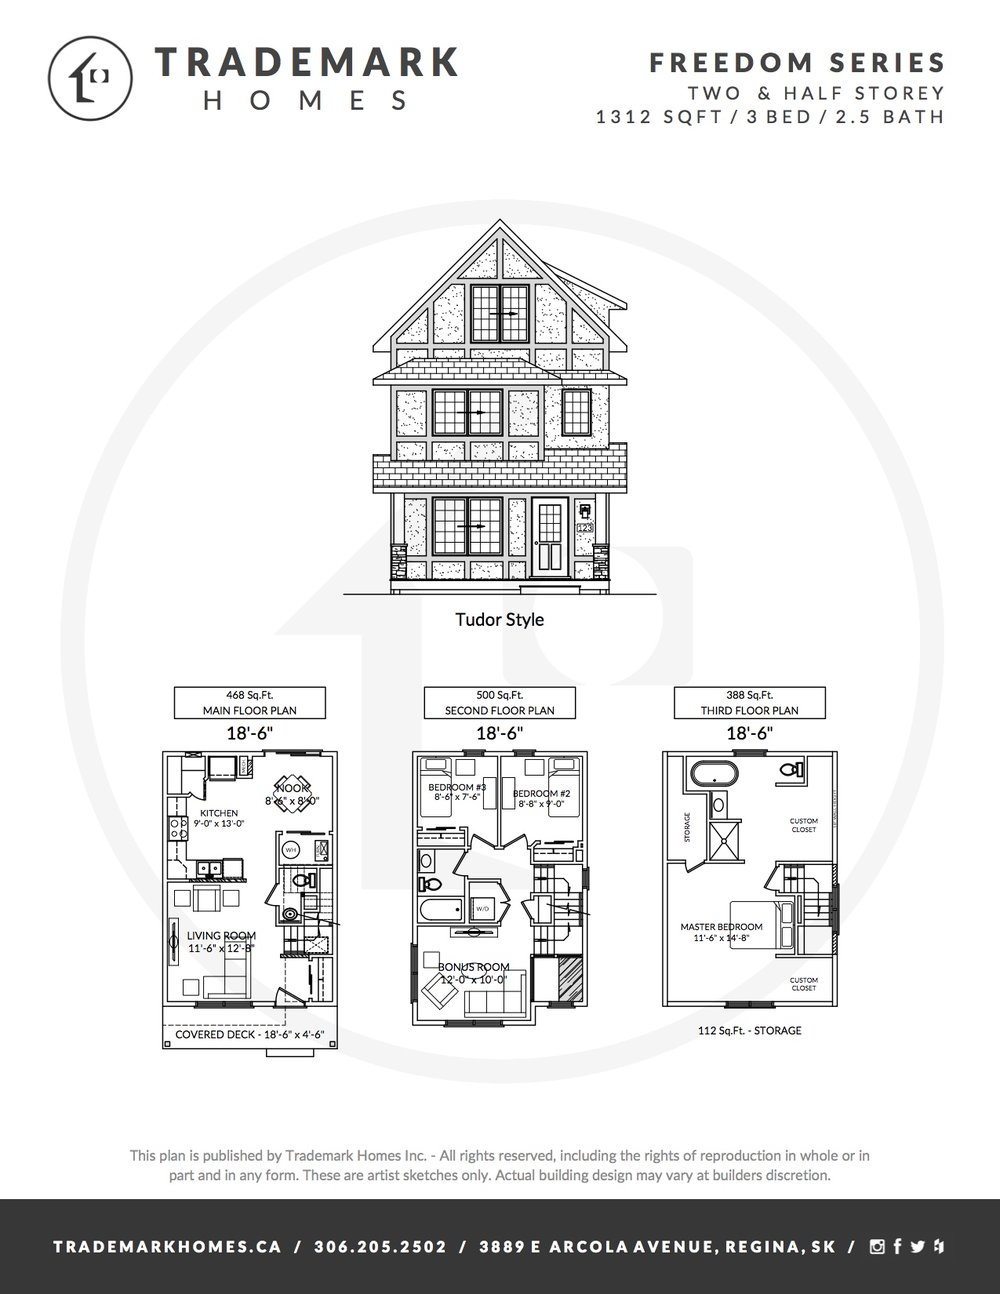 Freedom Homes - 2 & Half Storey - Floorplan - Westerra - Regina Home Builder